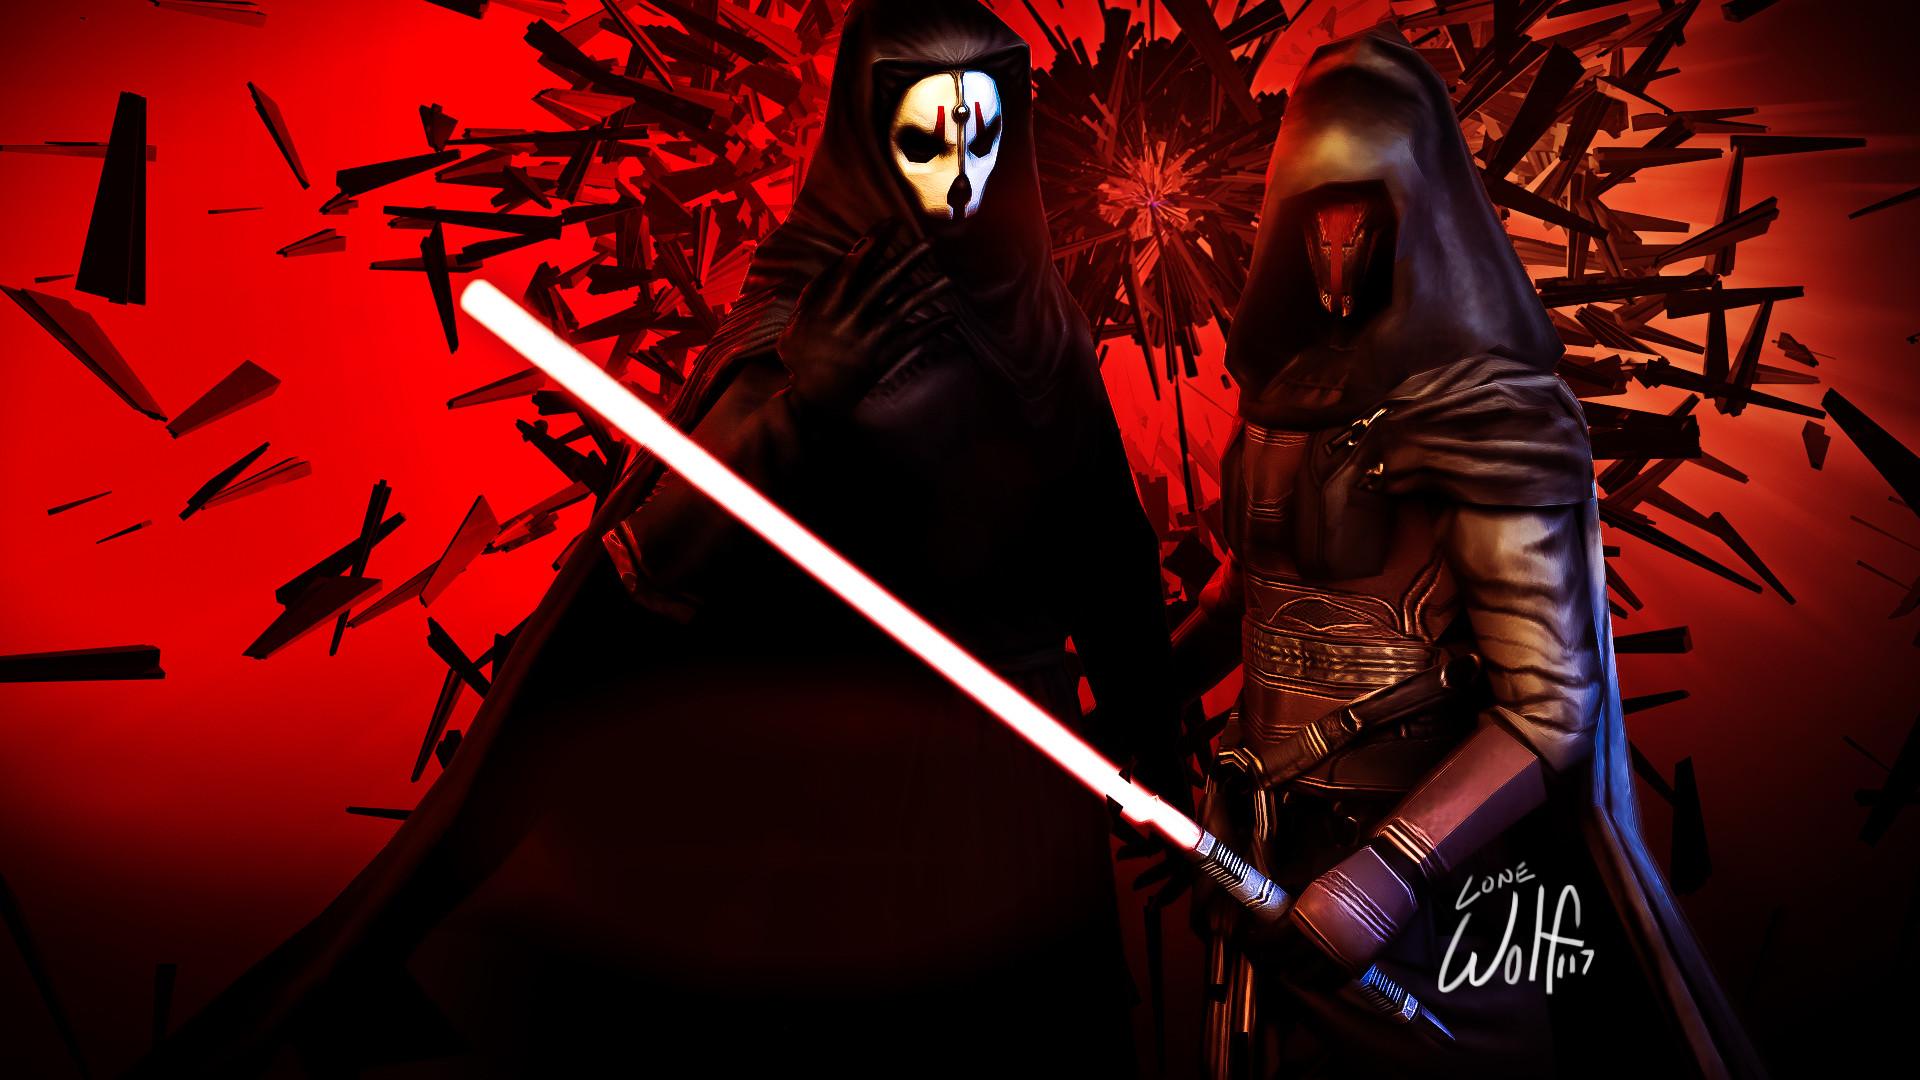 Sith Lord Wallpapers – WallpaperSafari